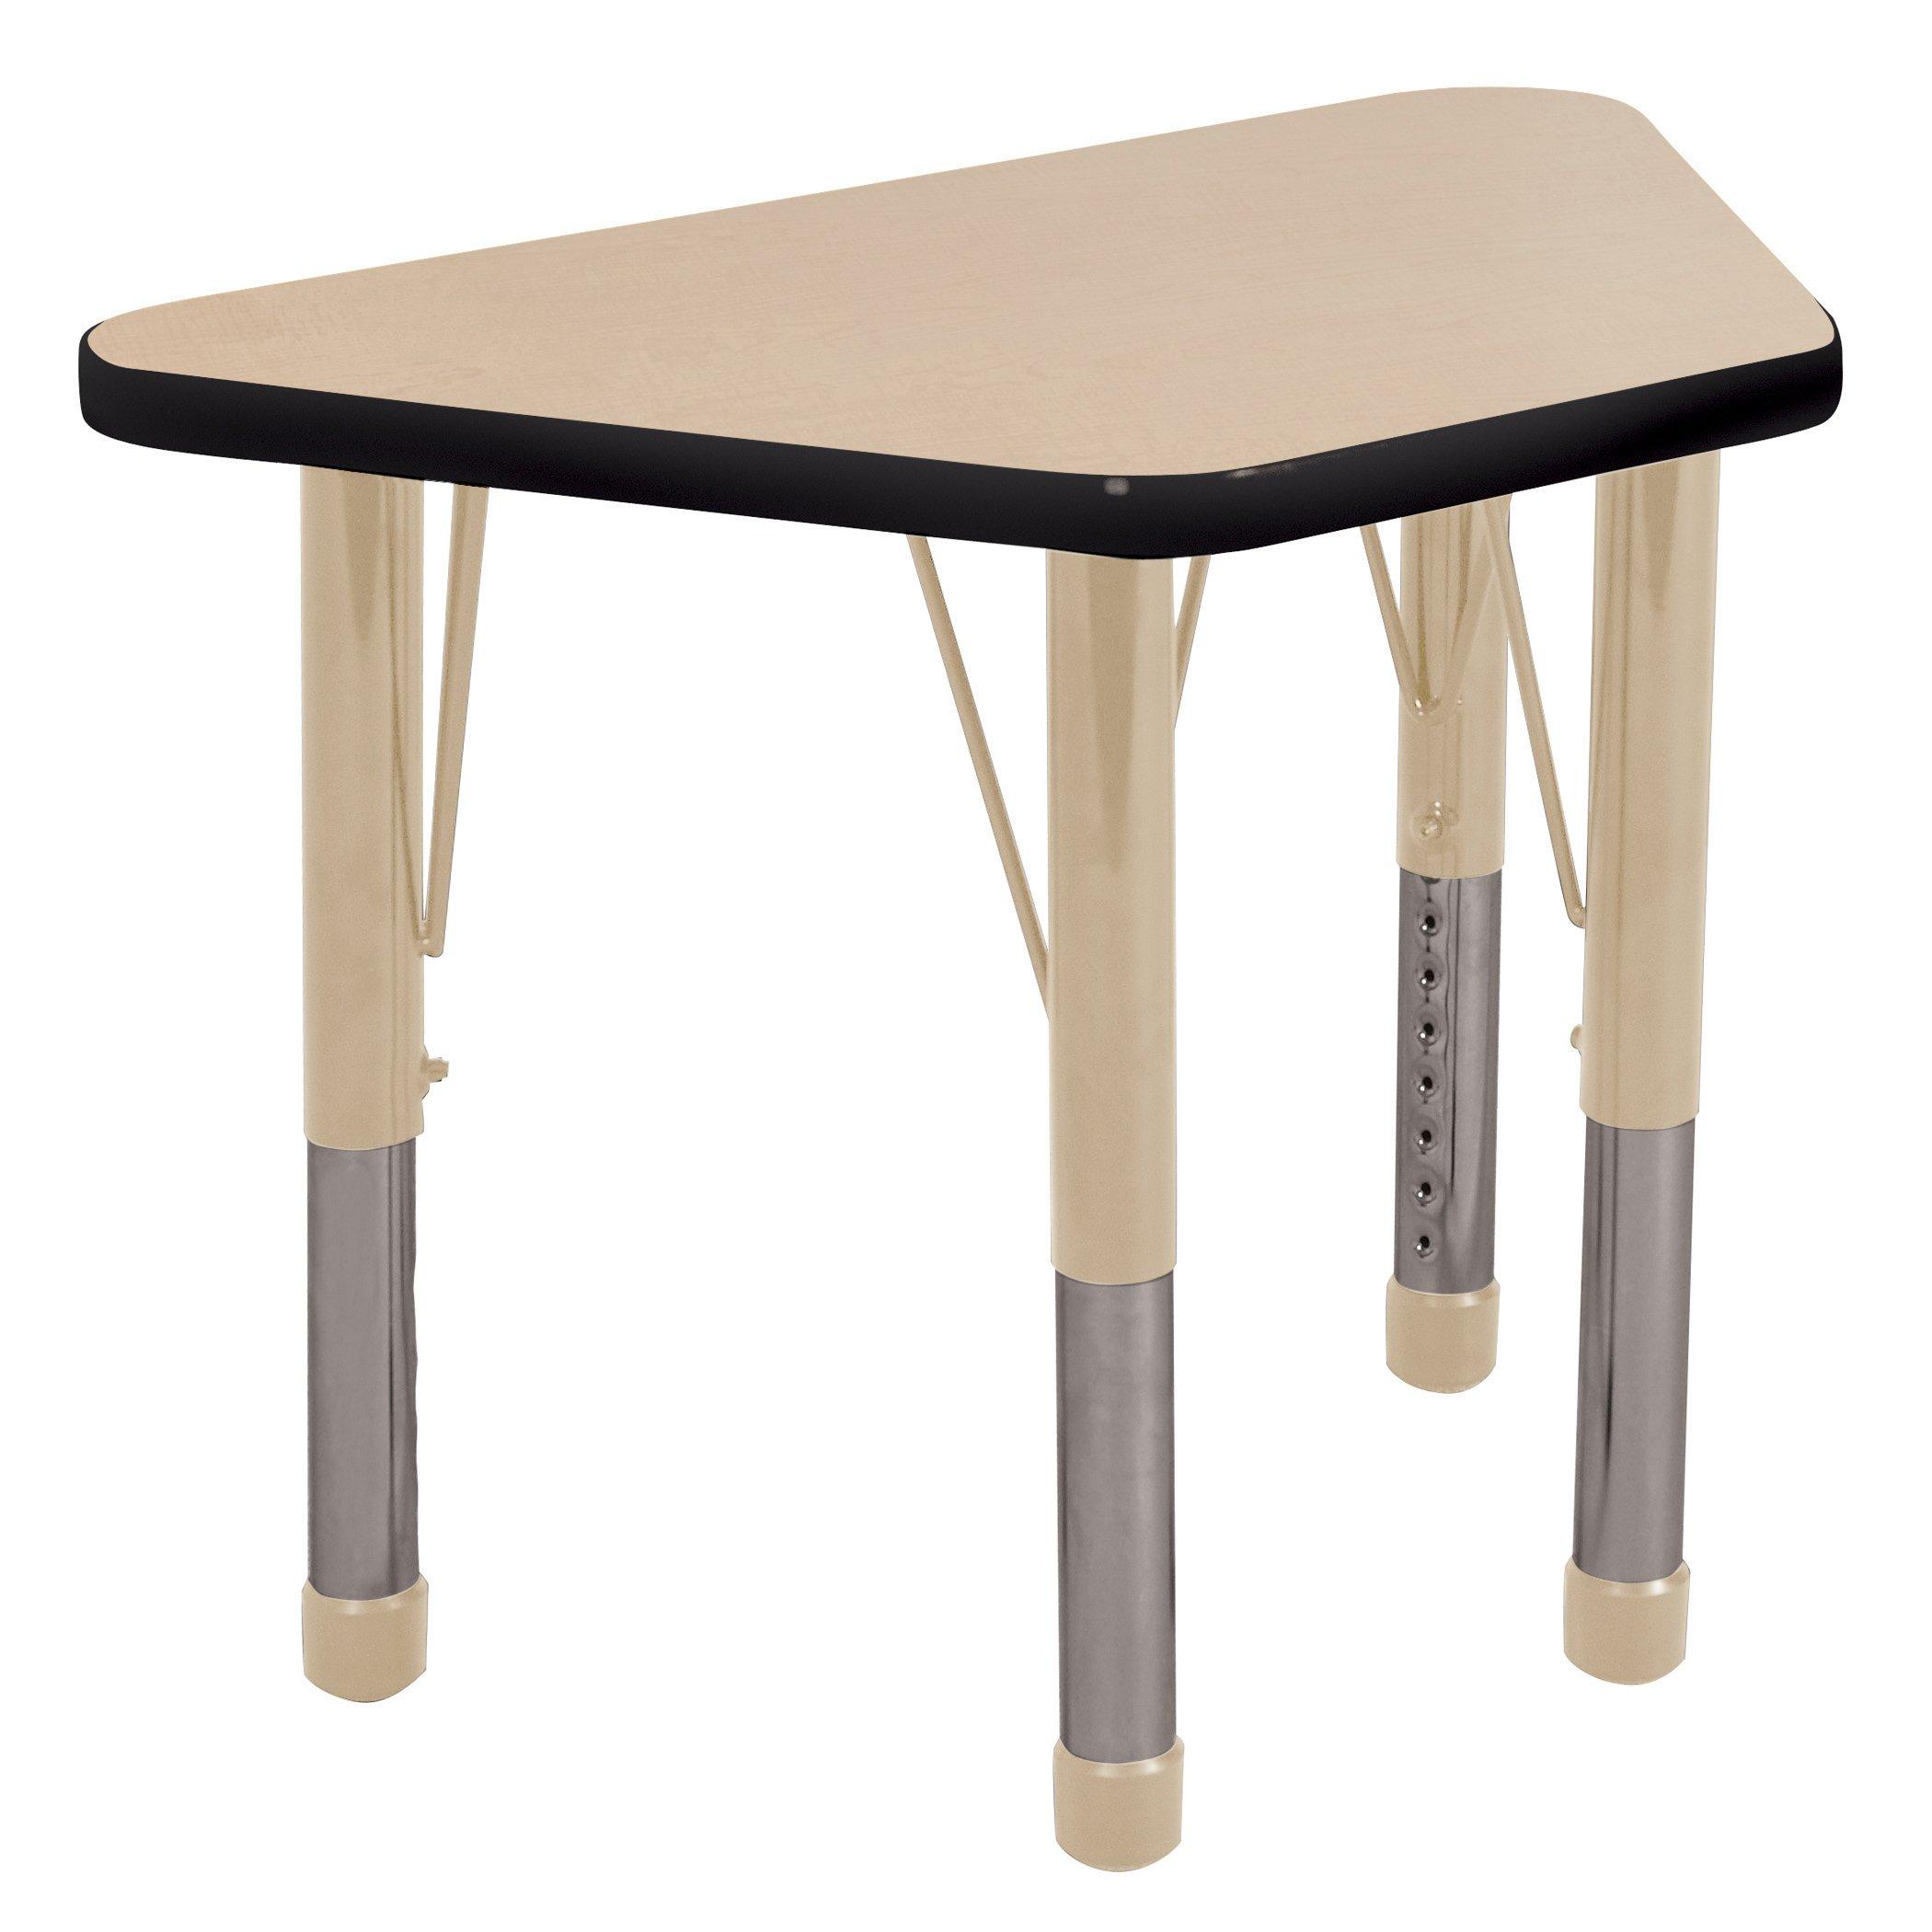 ECR4Kids Everyday T-Mold 18'' x 30'' Trapezoid Activity School Table, Chunky Legs, Adjustable Height 15-24 inch (Maple/Black/Sand)